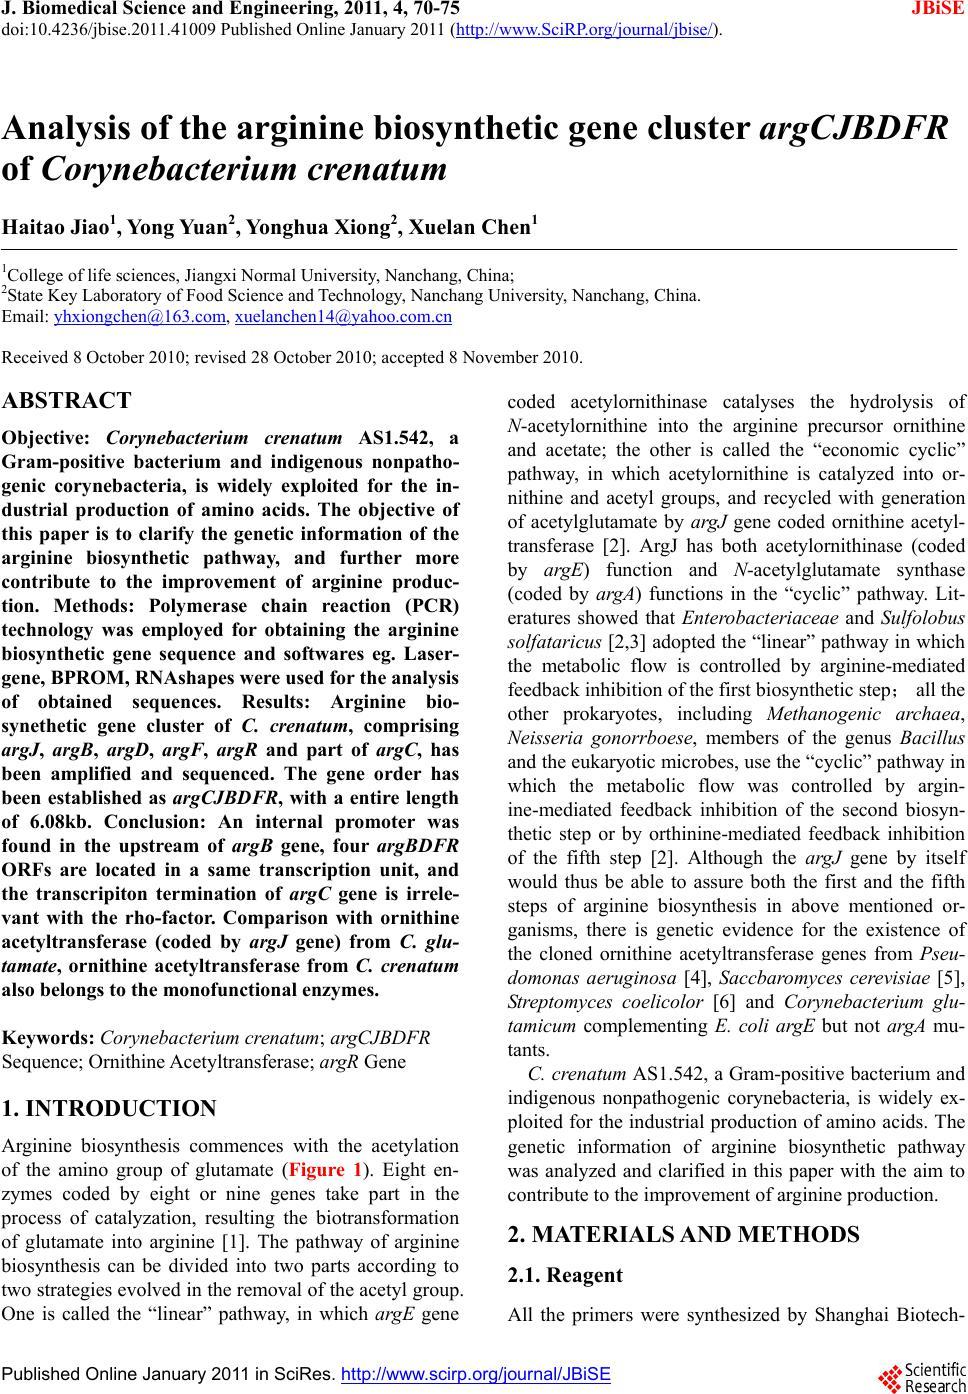 Analysis Of The Arginine Biosynthetic Gene Cluster Argcjbdfr One Nine Sequencer Corynebacterium Crenatum